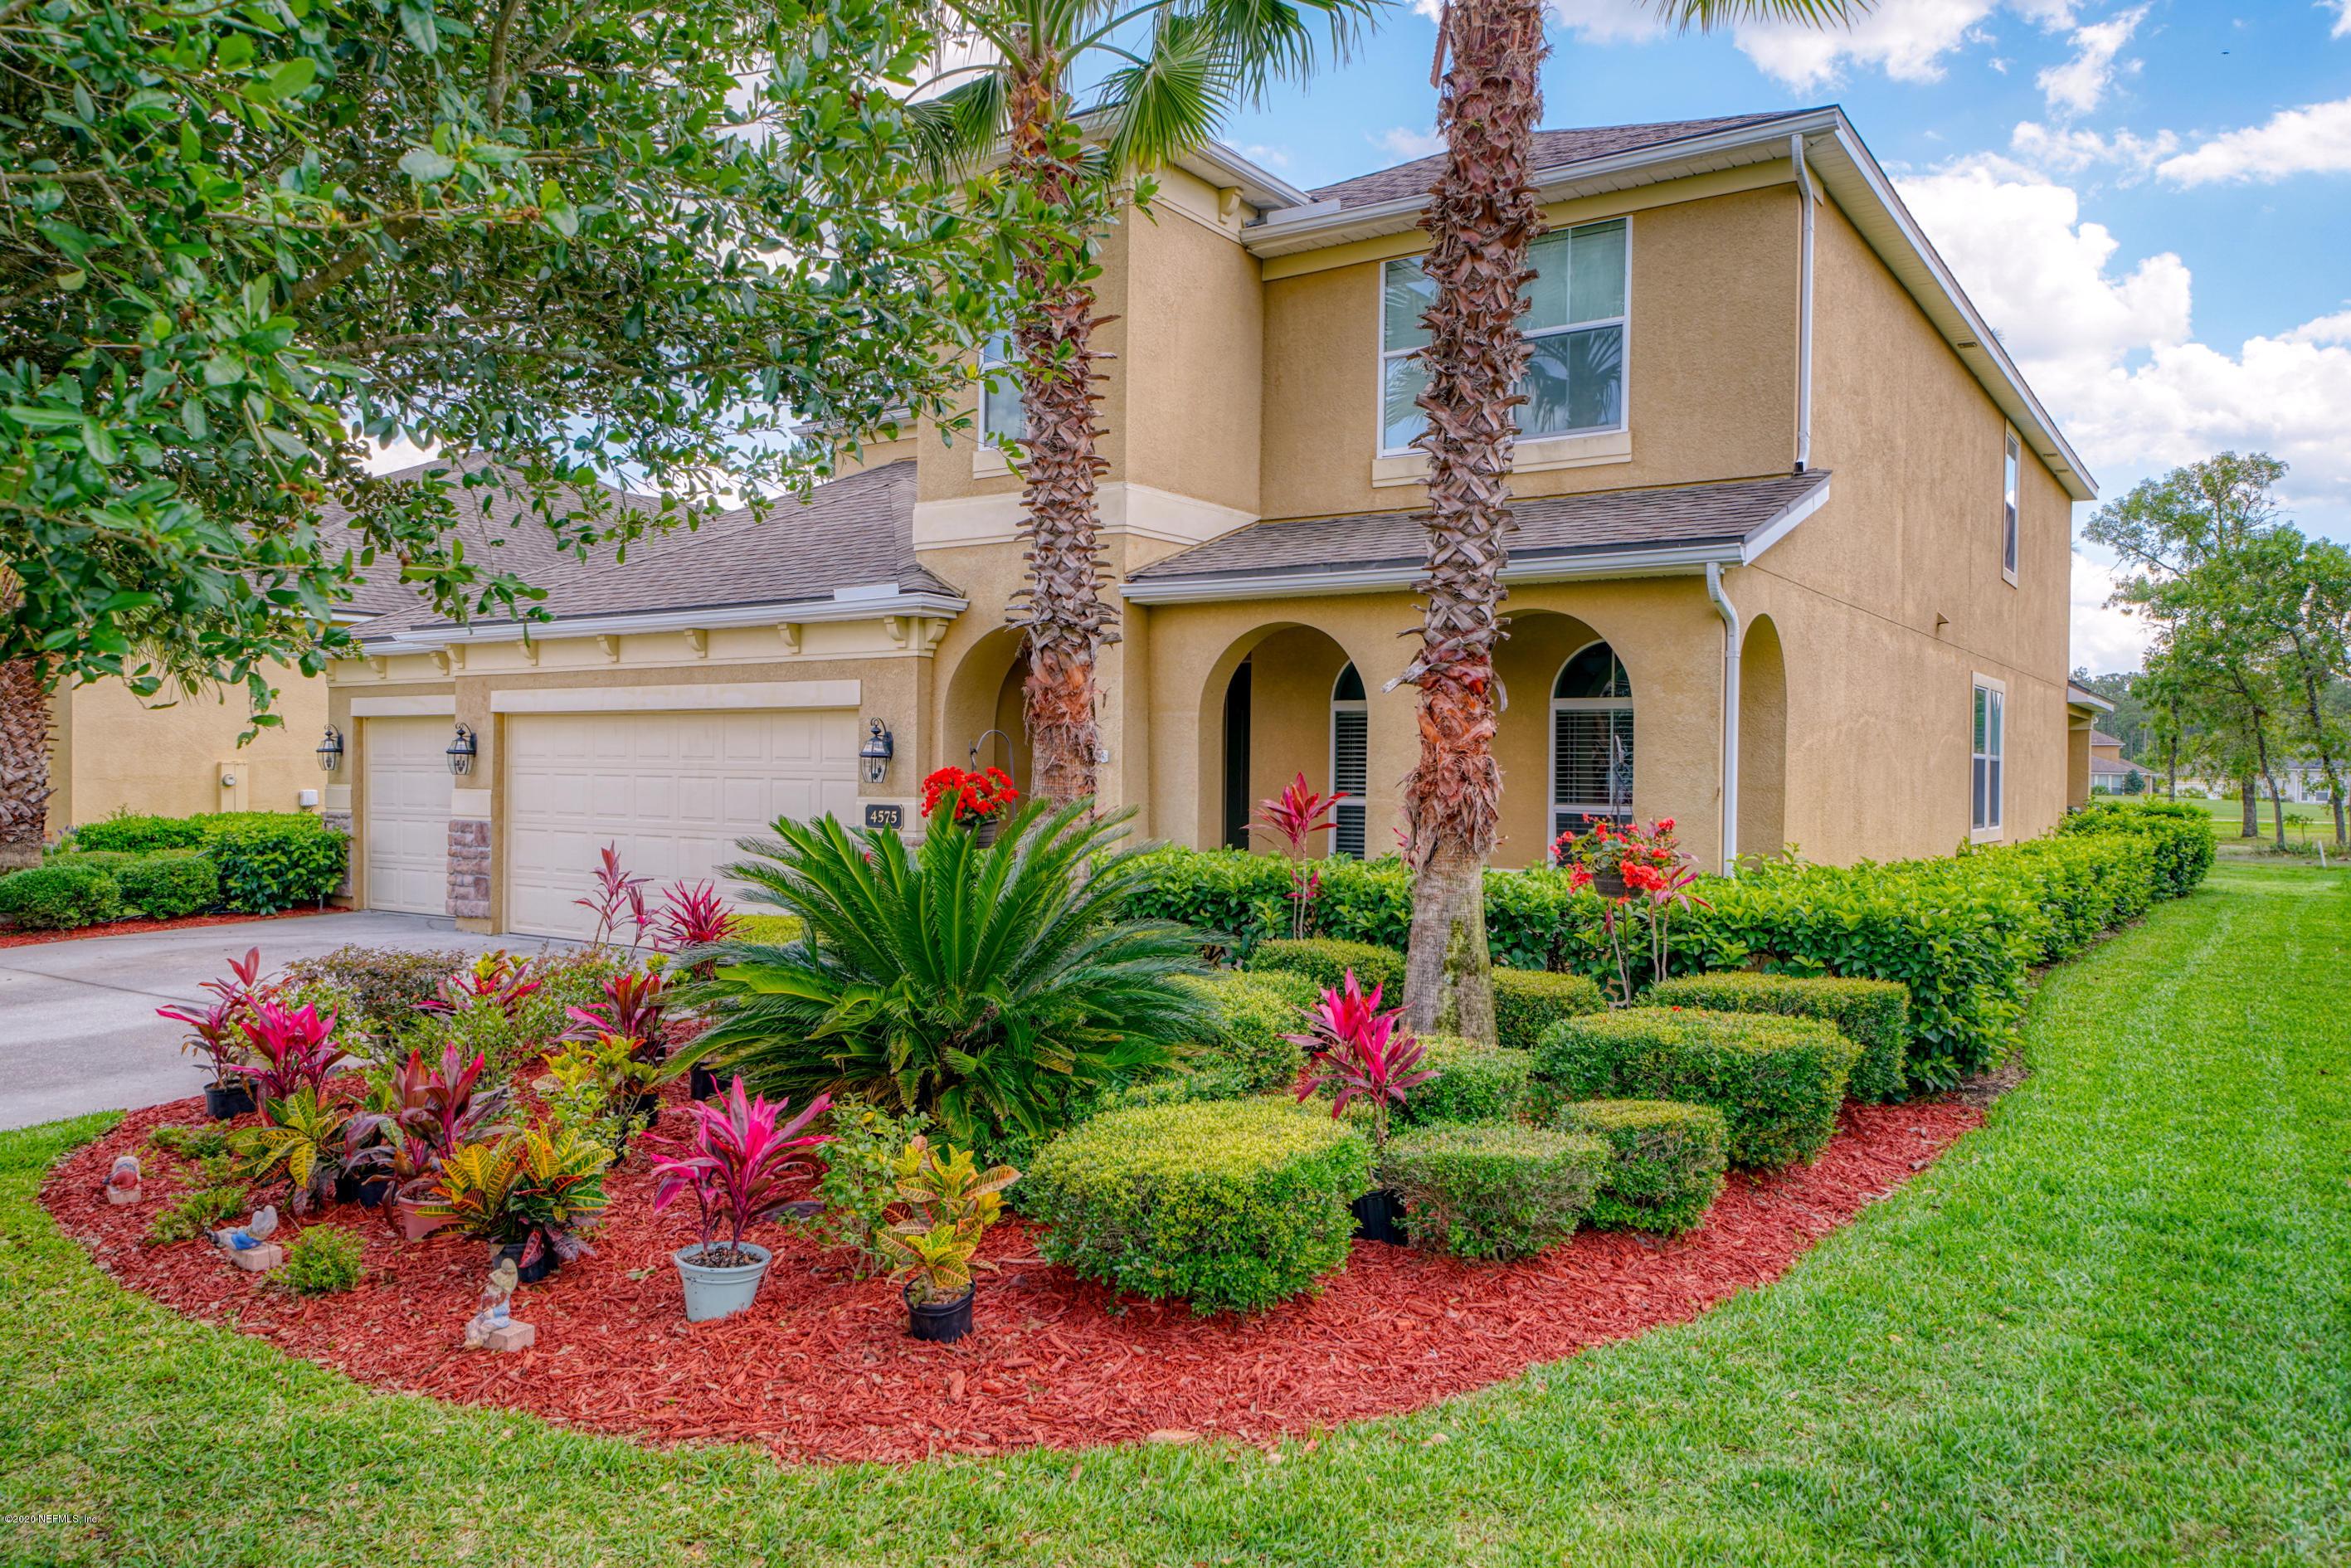 4575 GOLF BROOK, ORANGE PARK, FLORIDA 32065, 5 Bedrooms Bedrooms, ,3 BathroomsBathrooms,Residential,For sale,GOLF BROOK,1076295